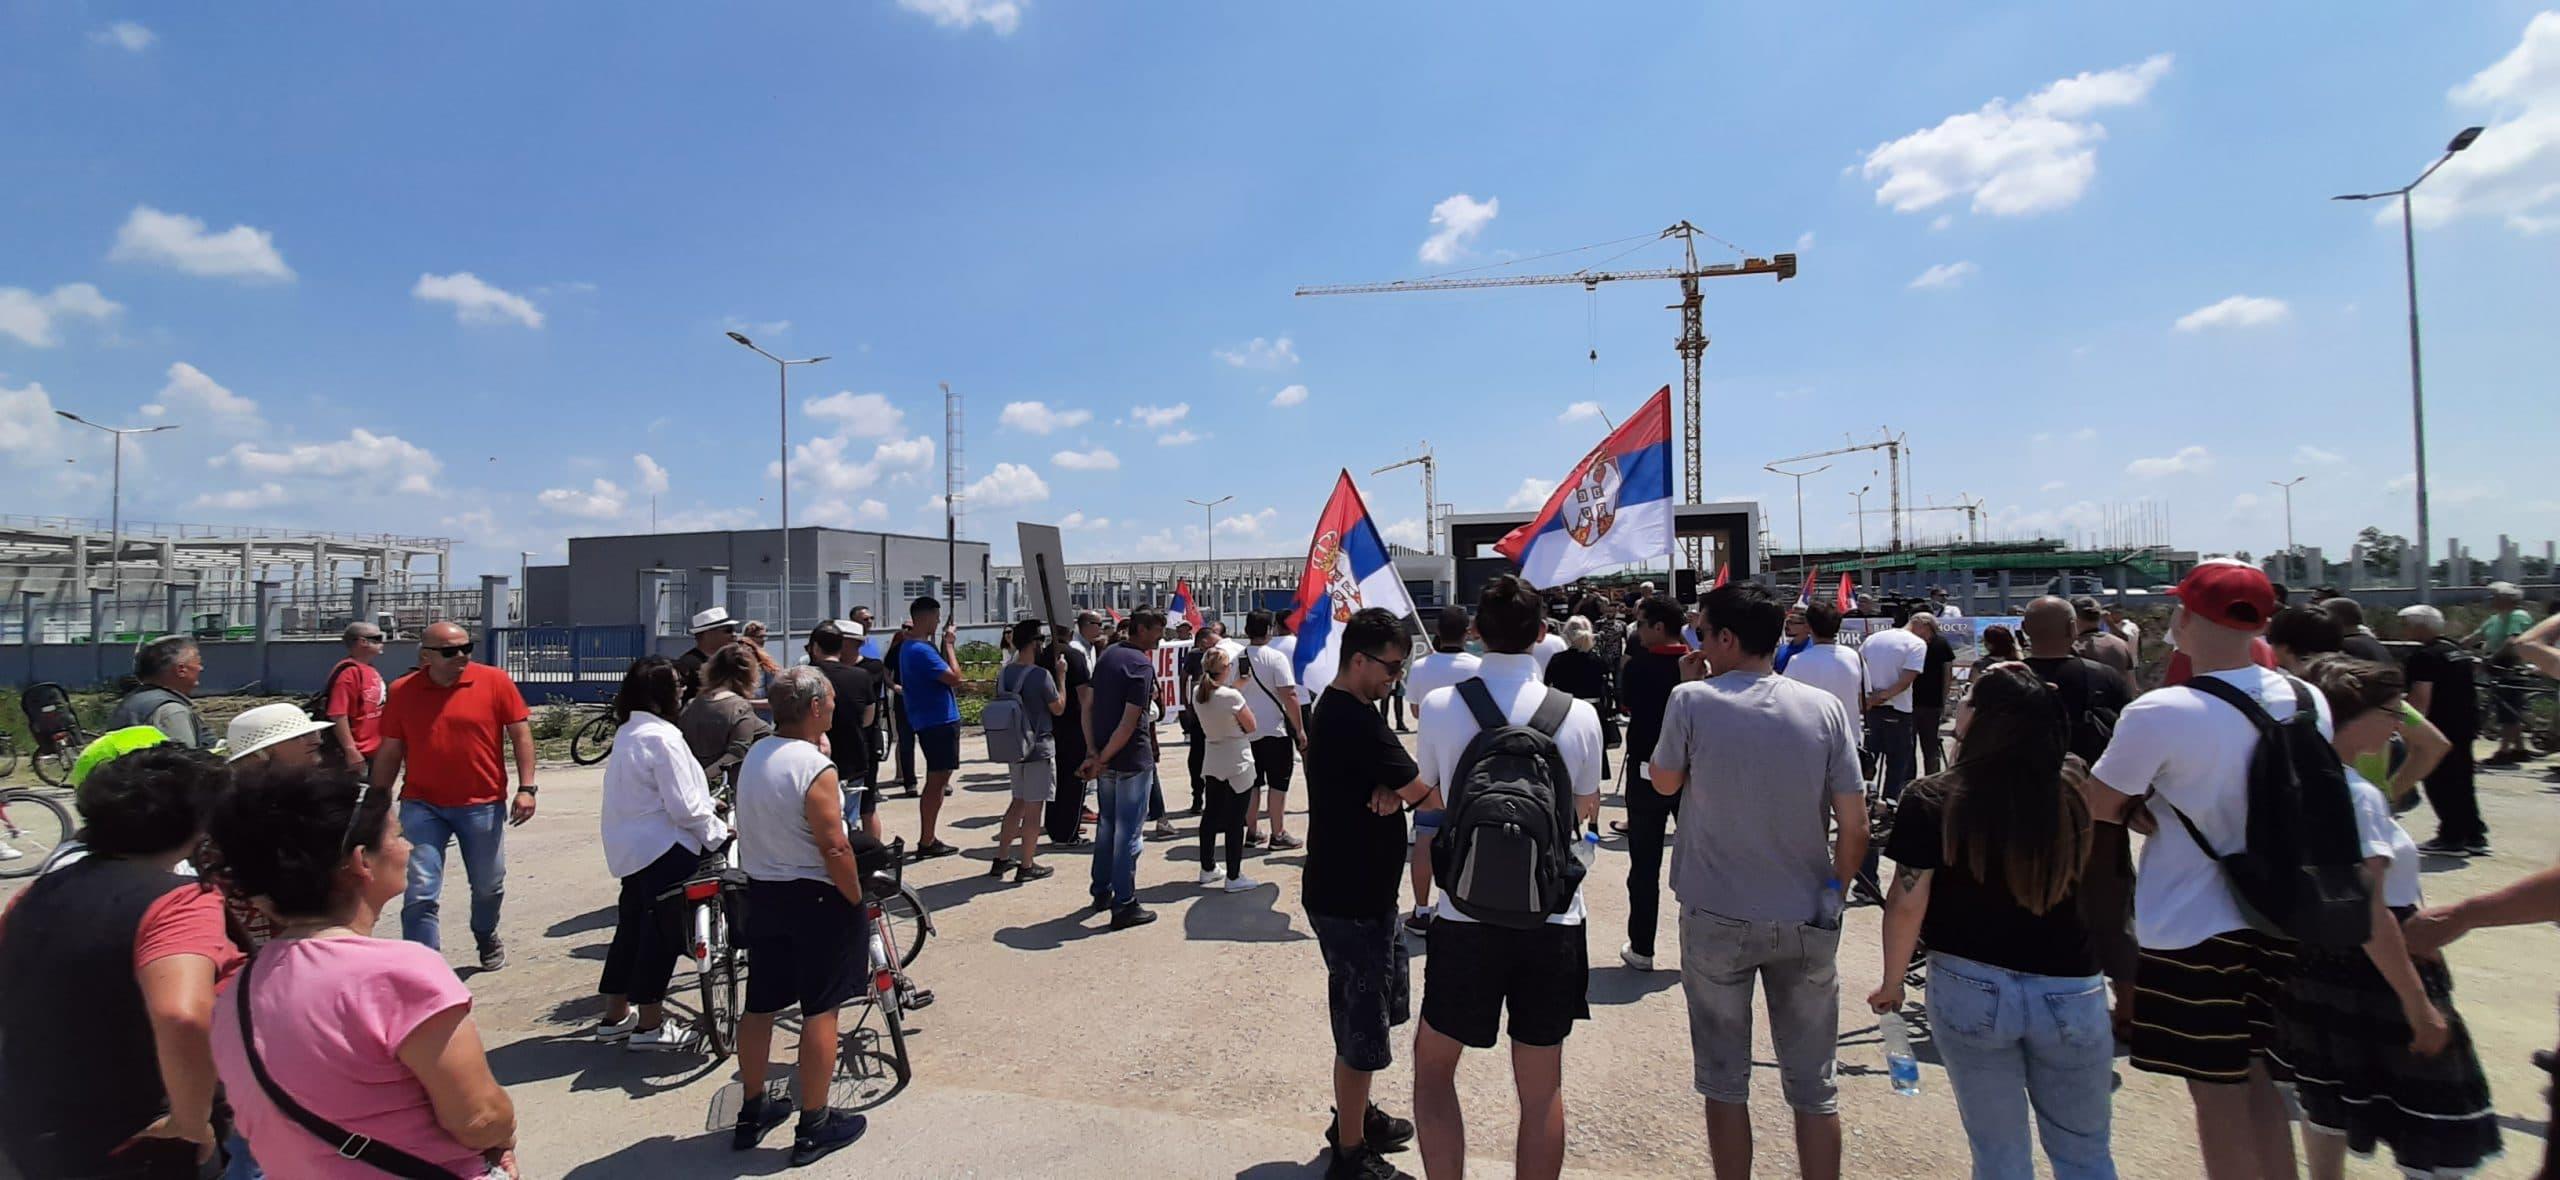 Zrenjanin: Veliki protest ispred Linglonga, protestanti traže poštovanje zakona i očuvanje životne sredine 2